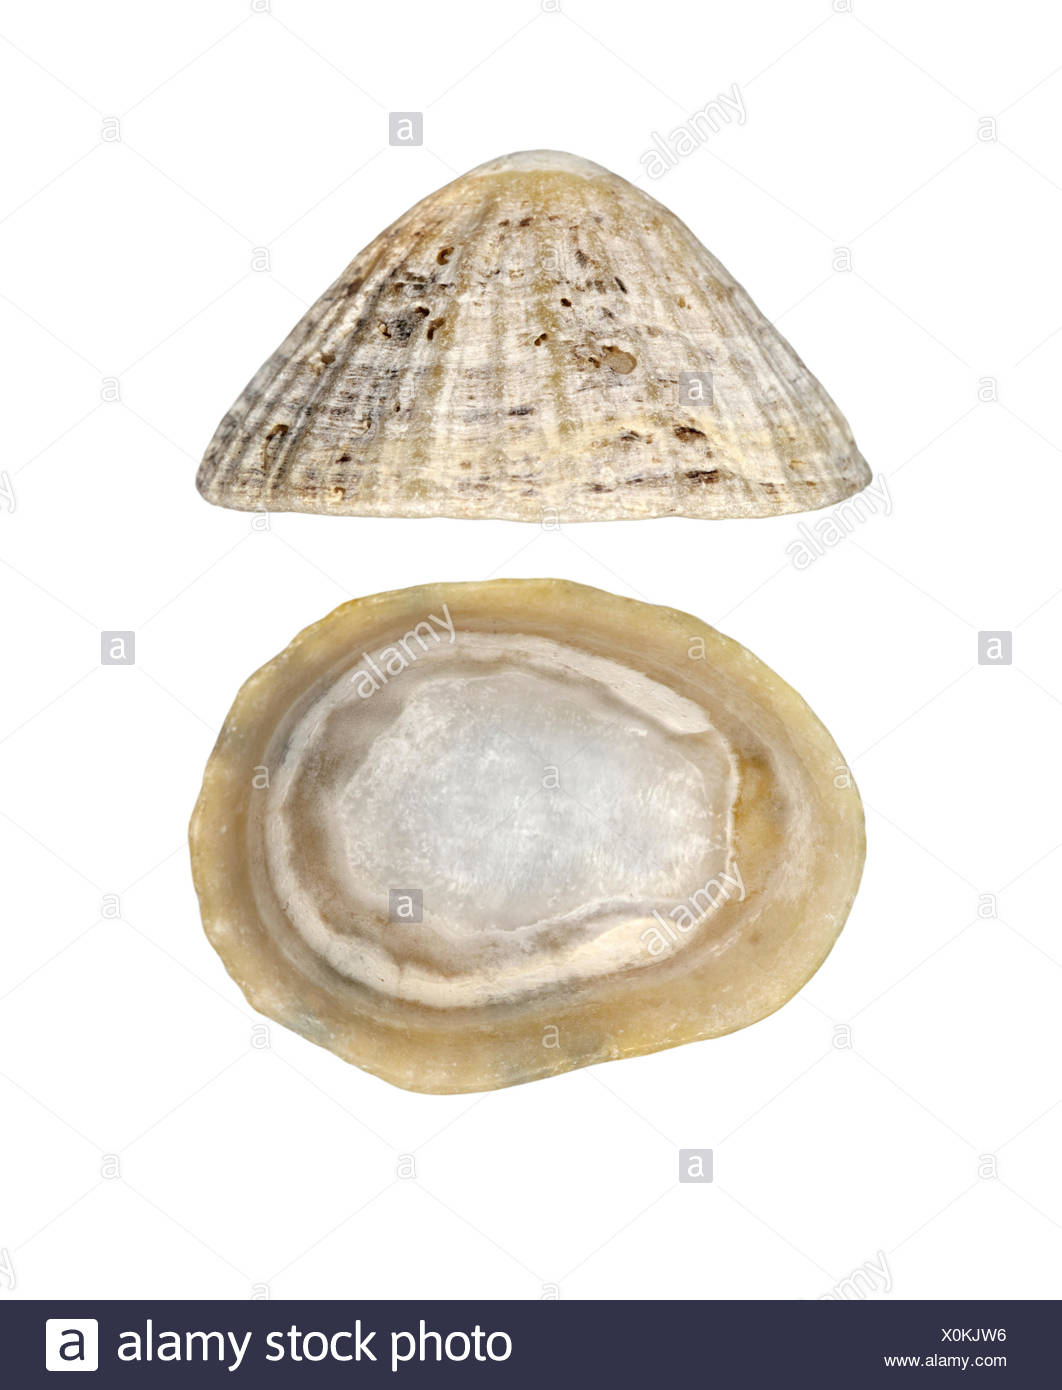 Common Limpet - Patina vulgaris - Stock Image